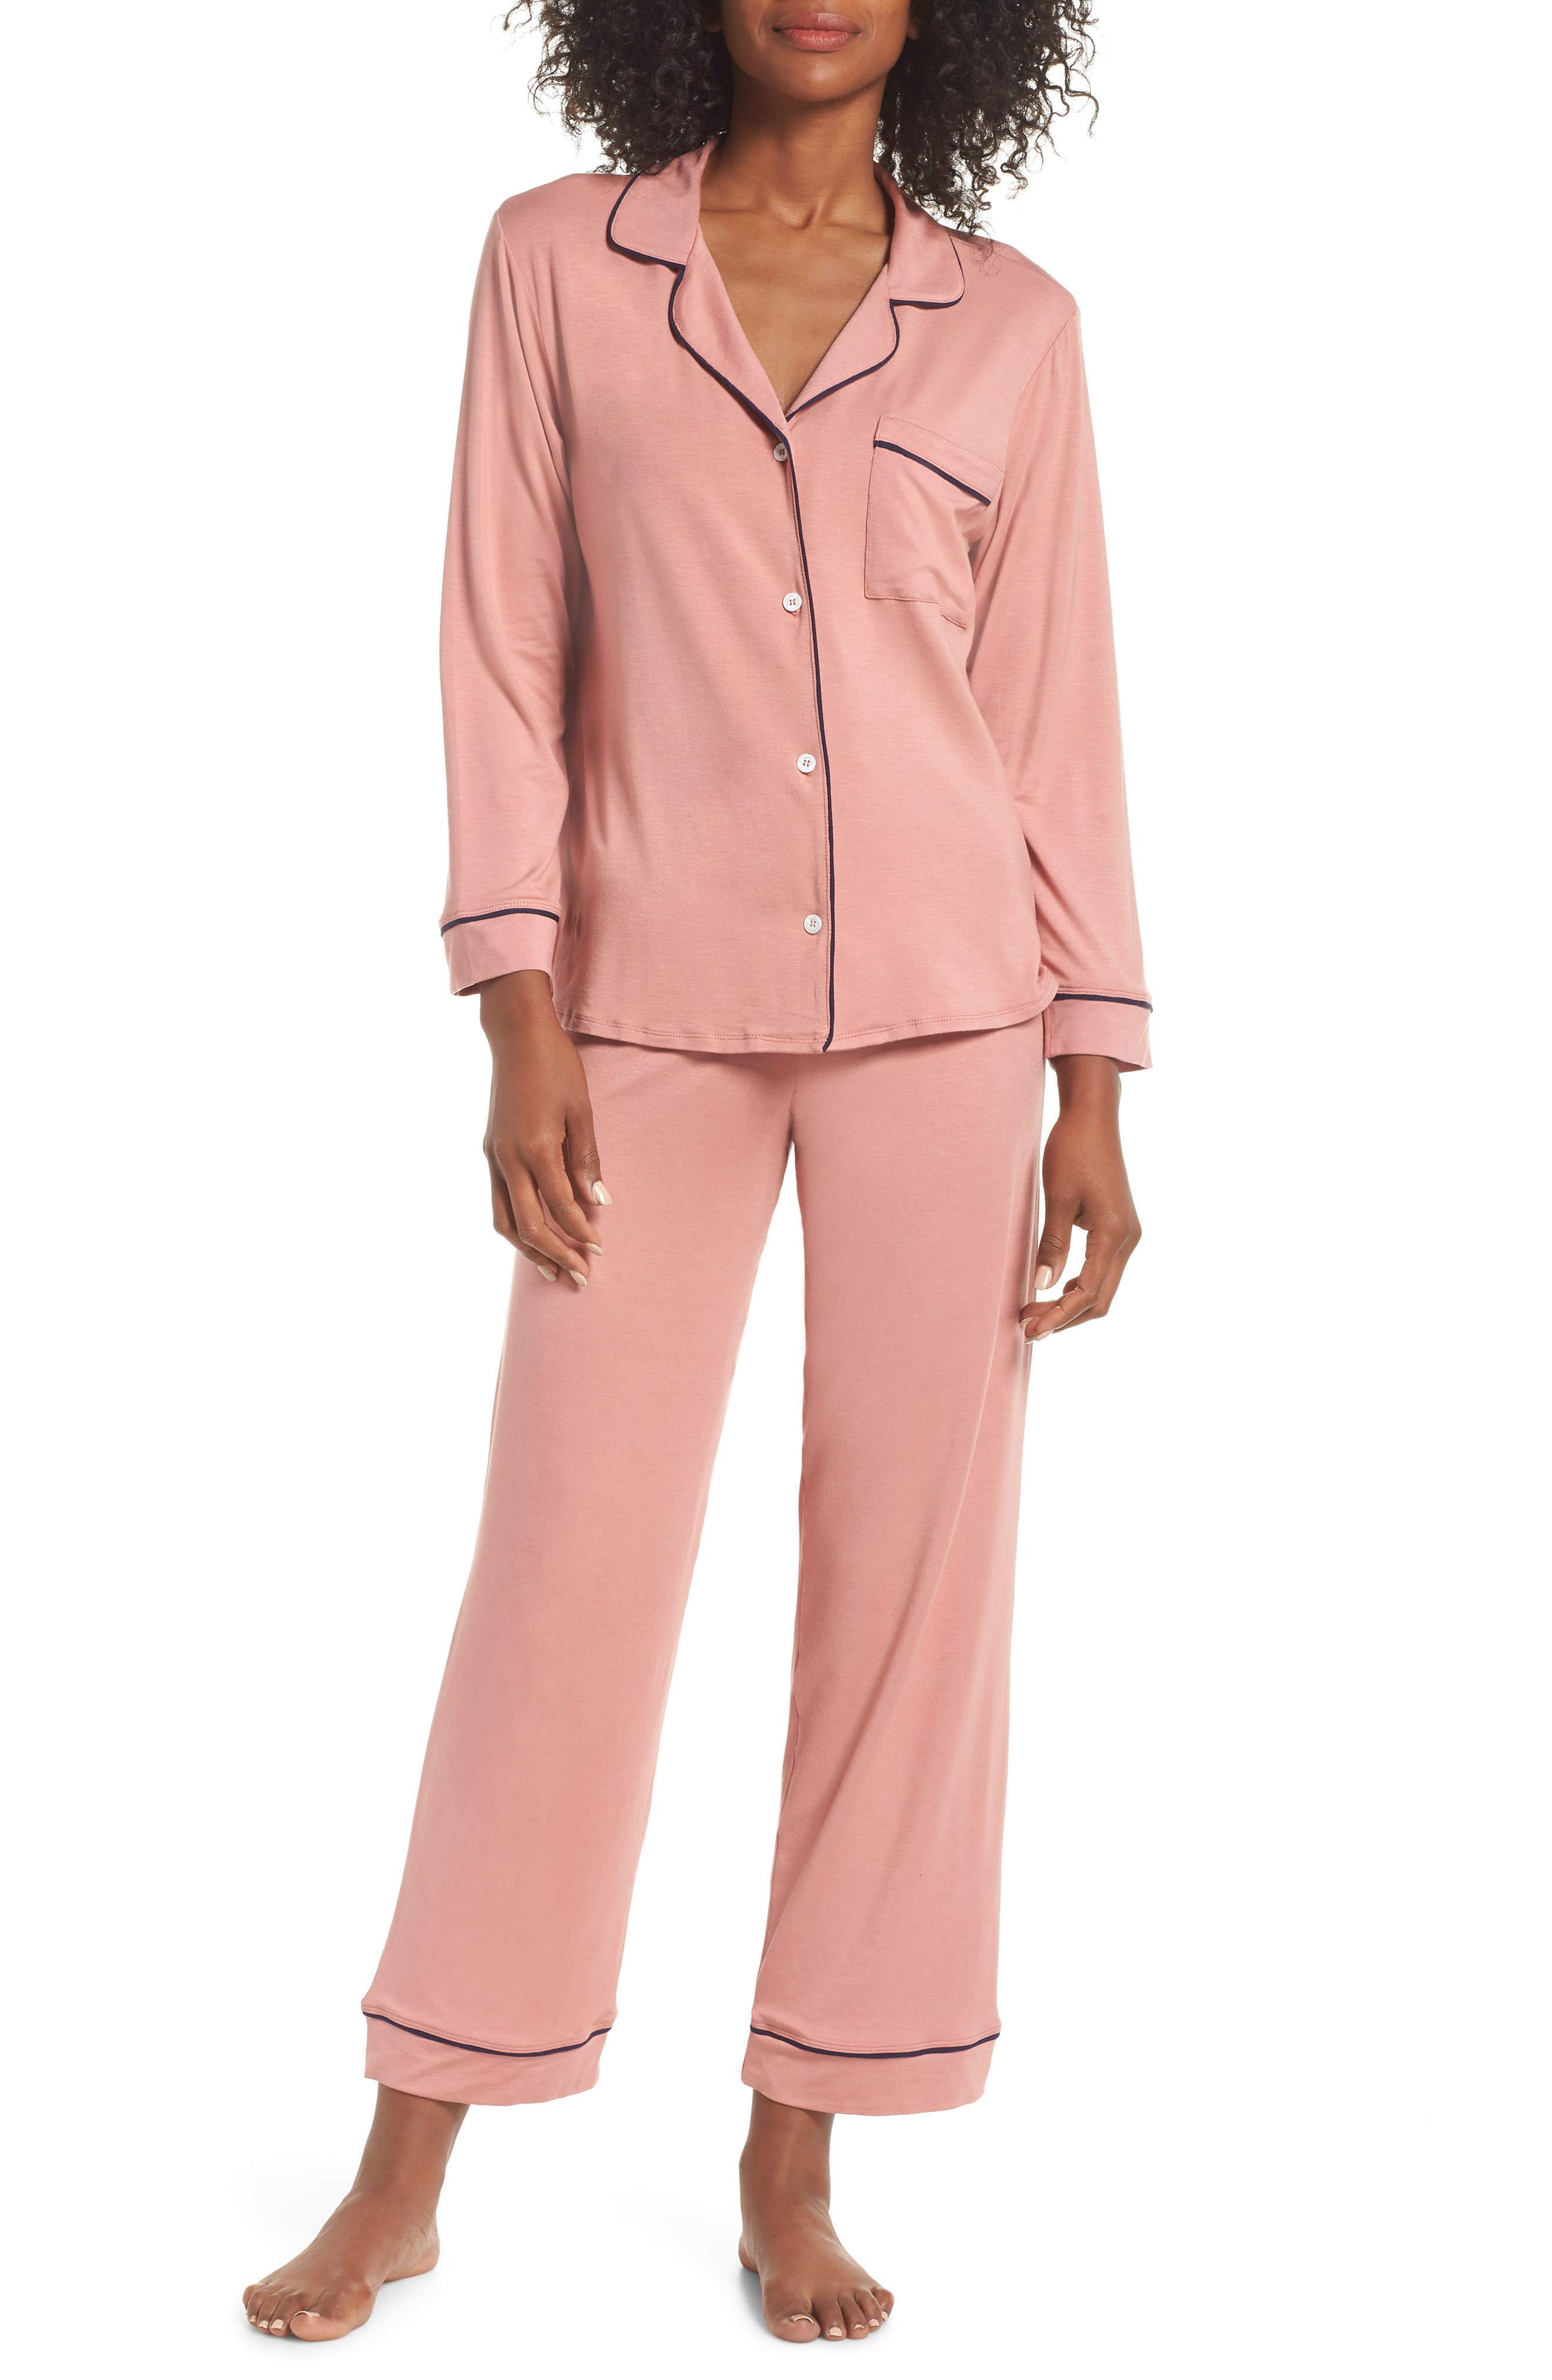 EBERJEY Gisele Pajamas, Main, color, 655